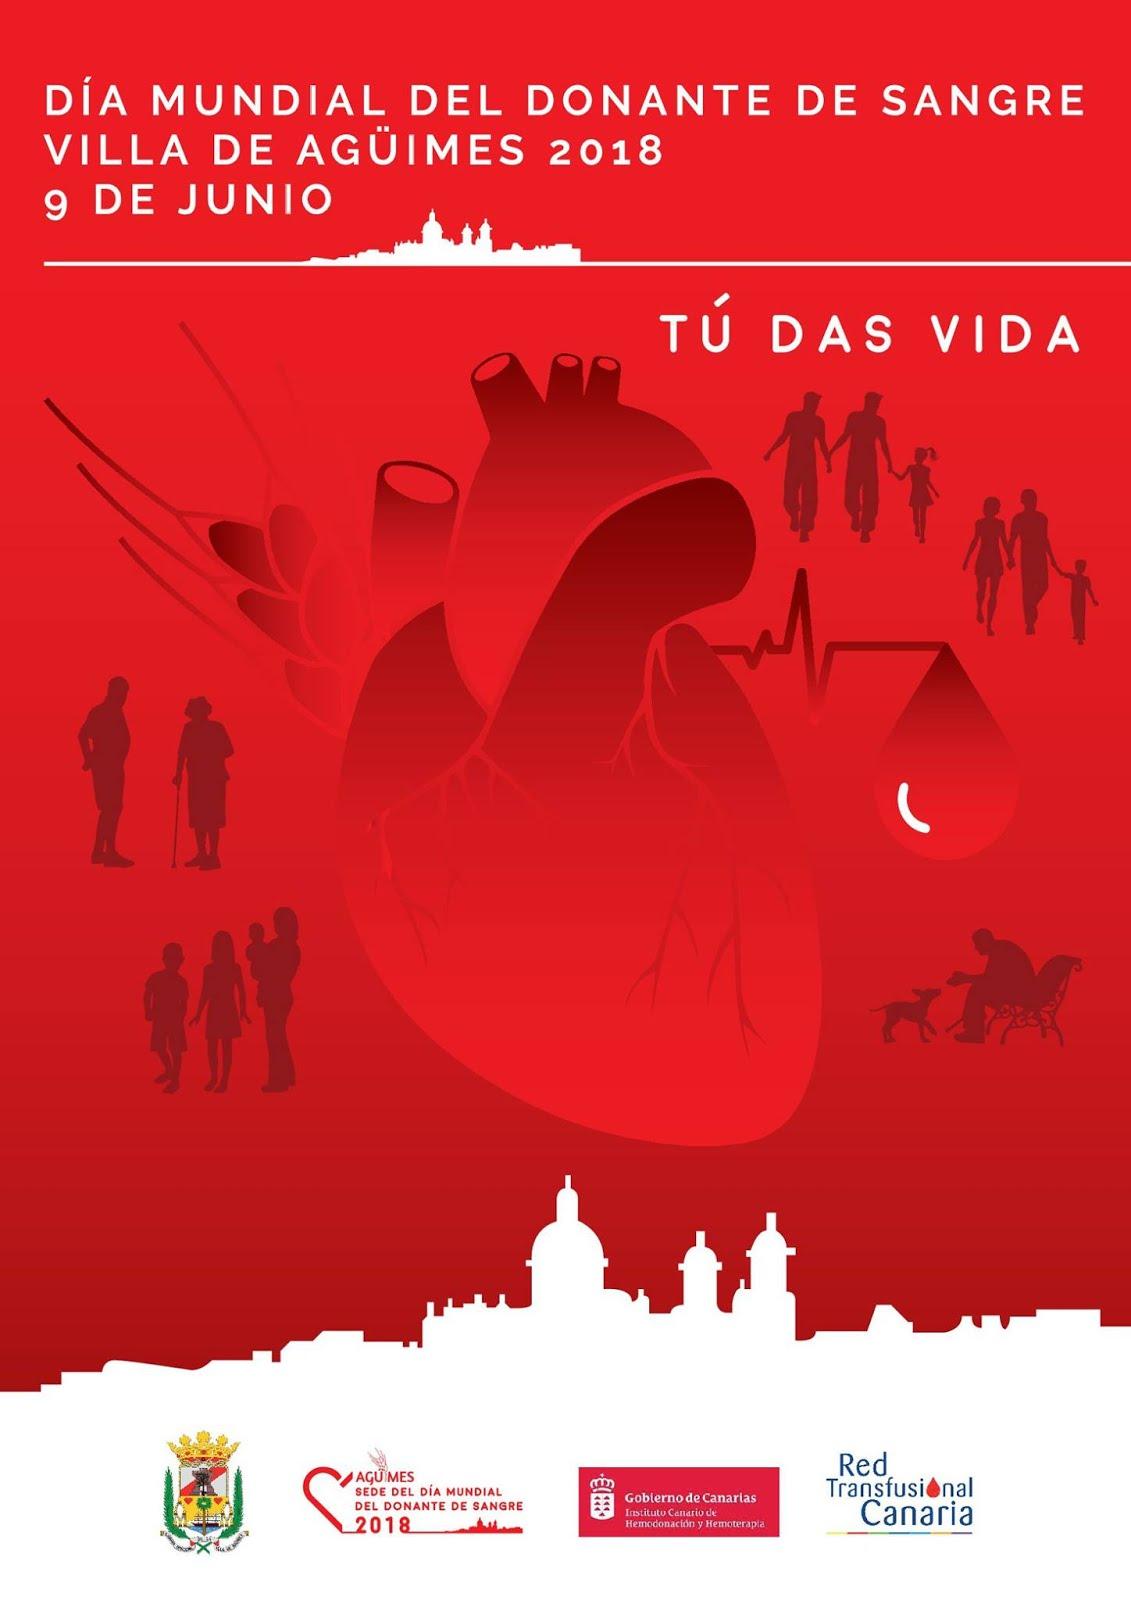 Día Mundial del Donante de Sangre-Agüimes 2018